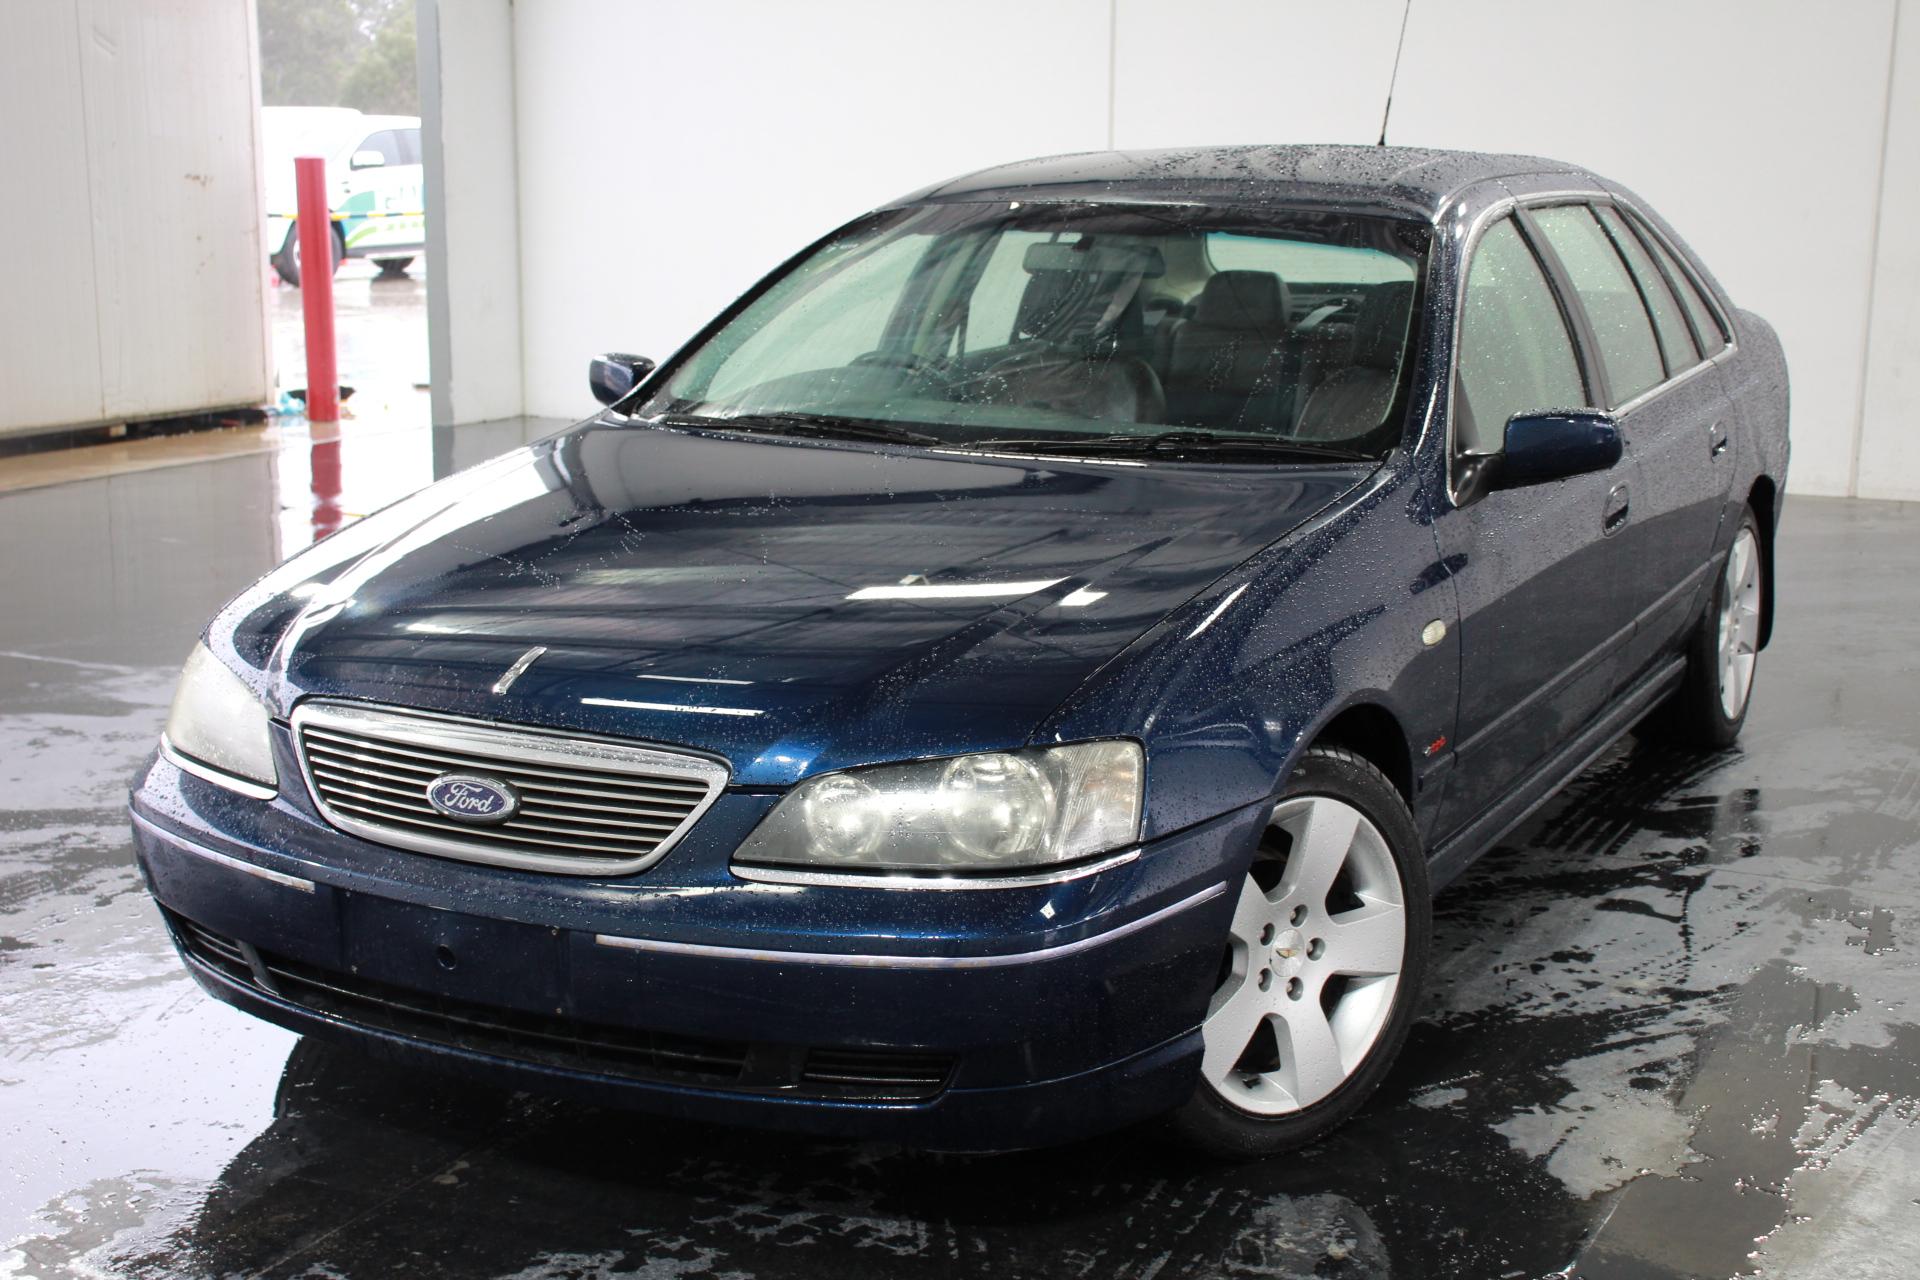 2003 Ford Fairlane G220 BA Automatic Sedan